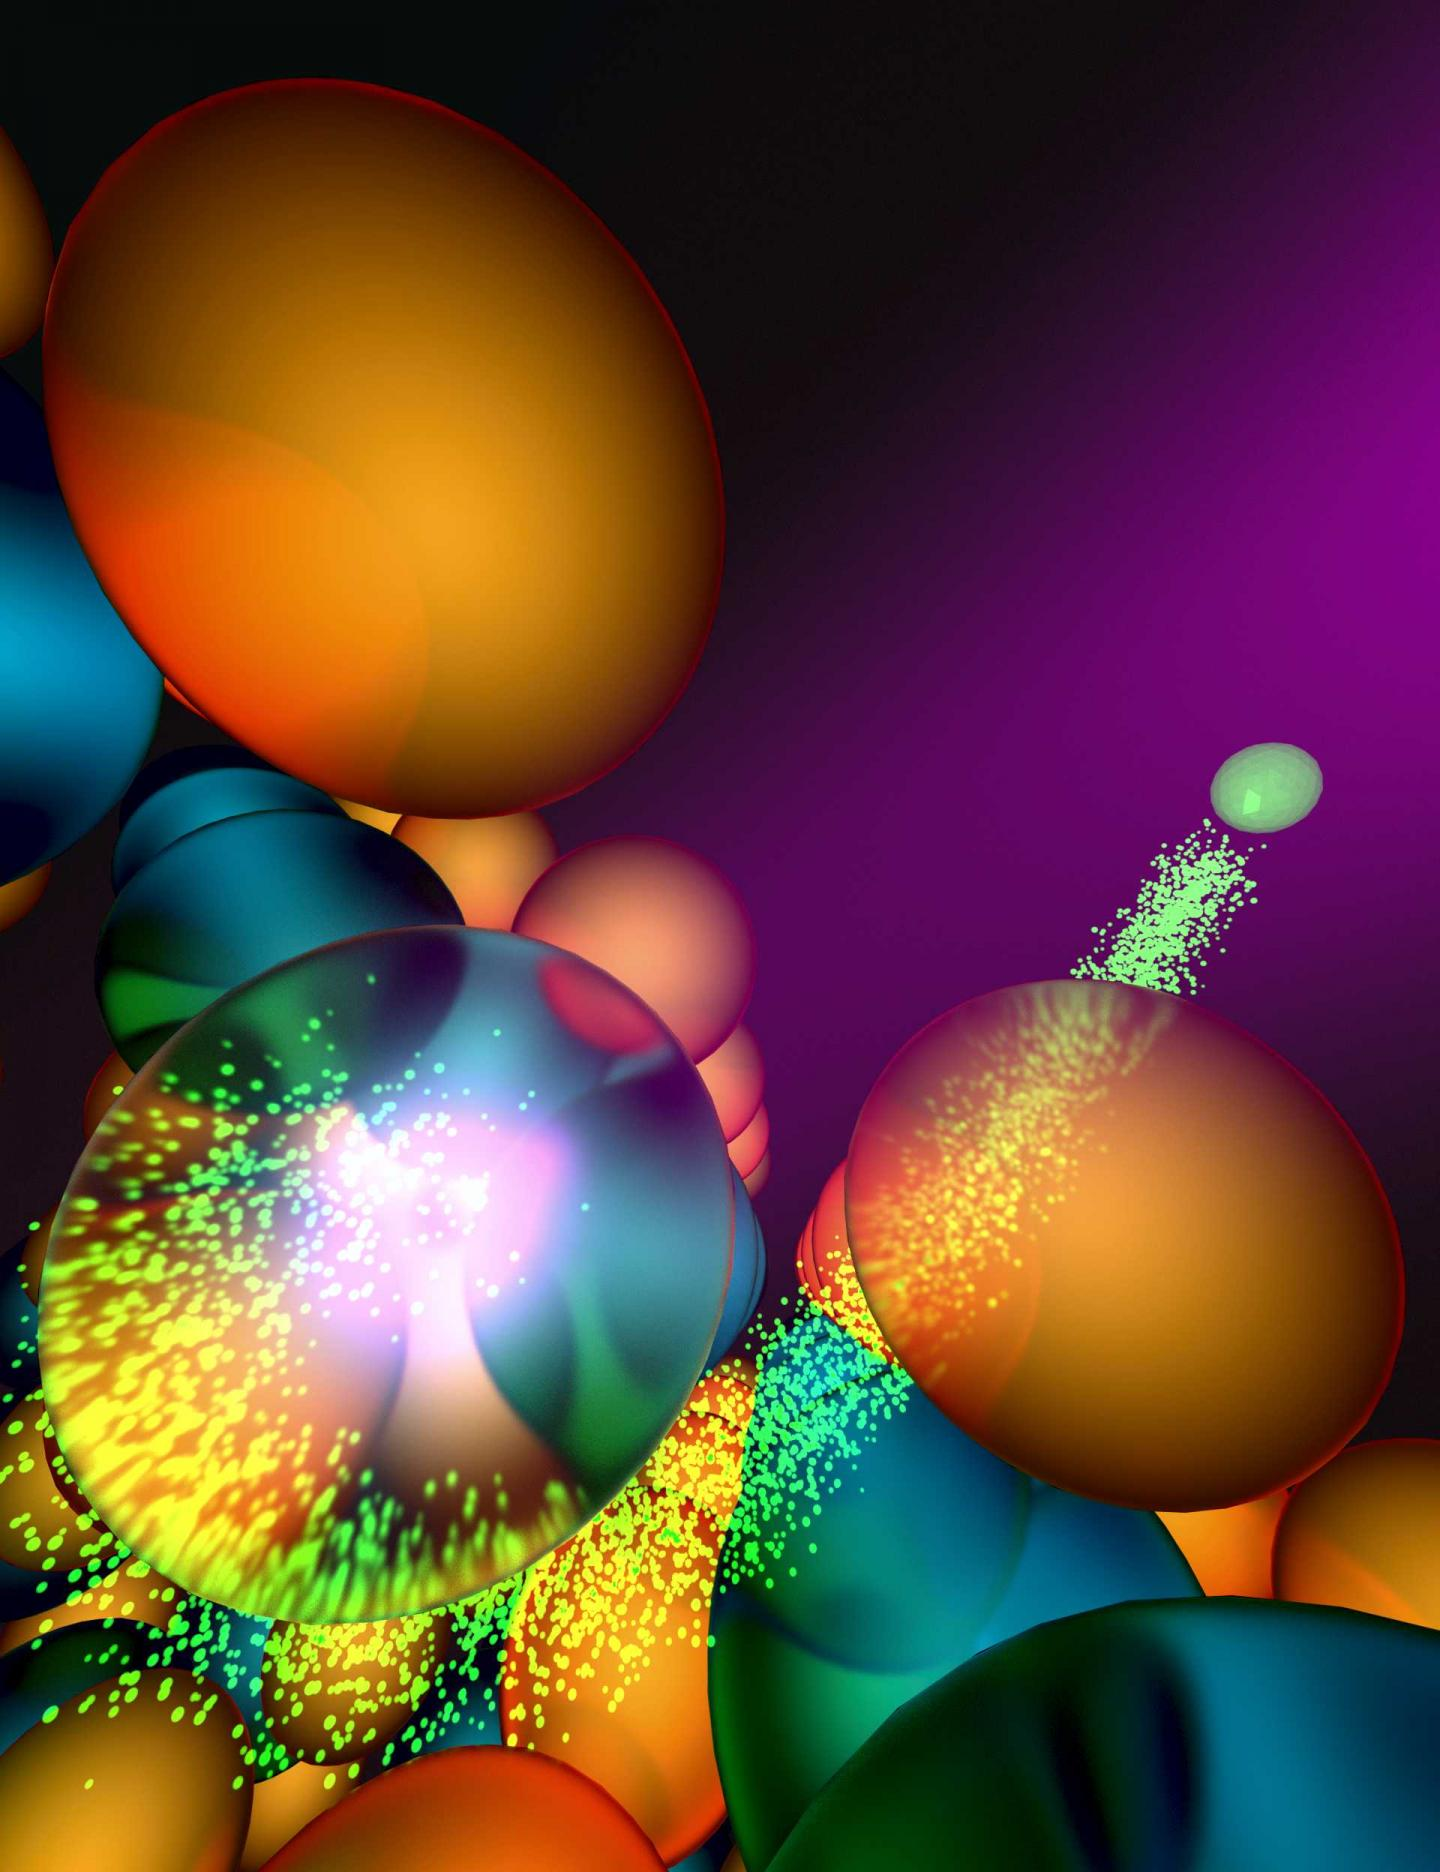 Dancing Electrons